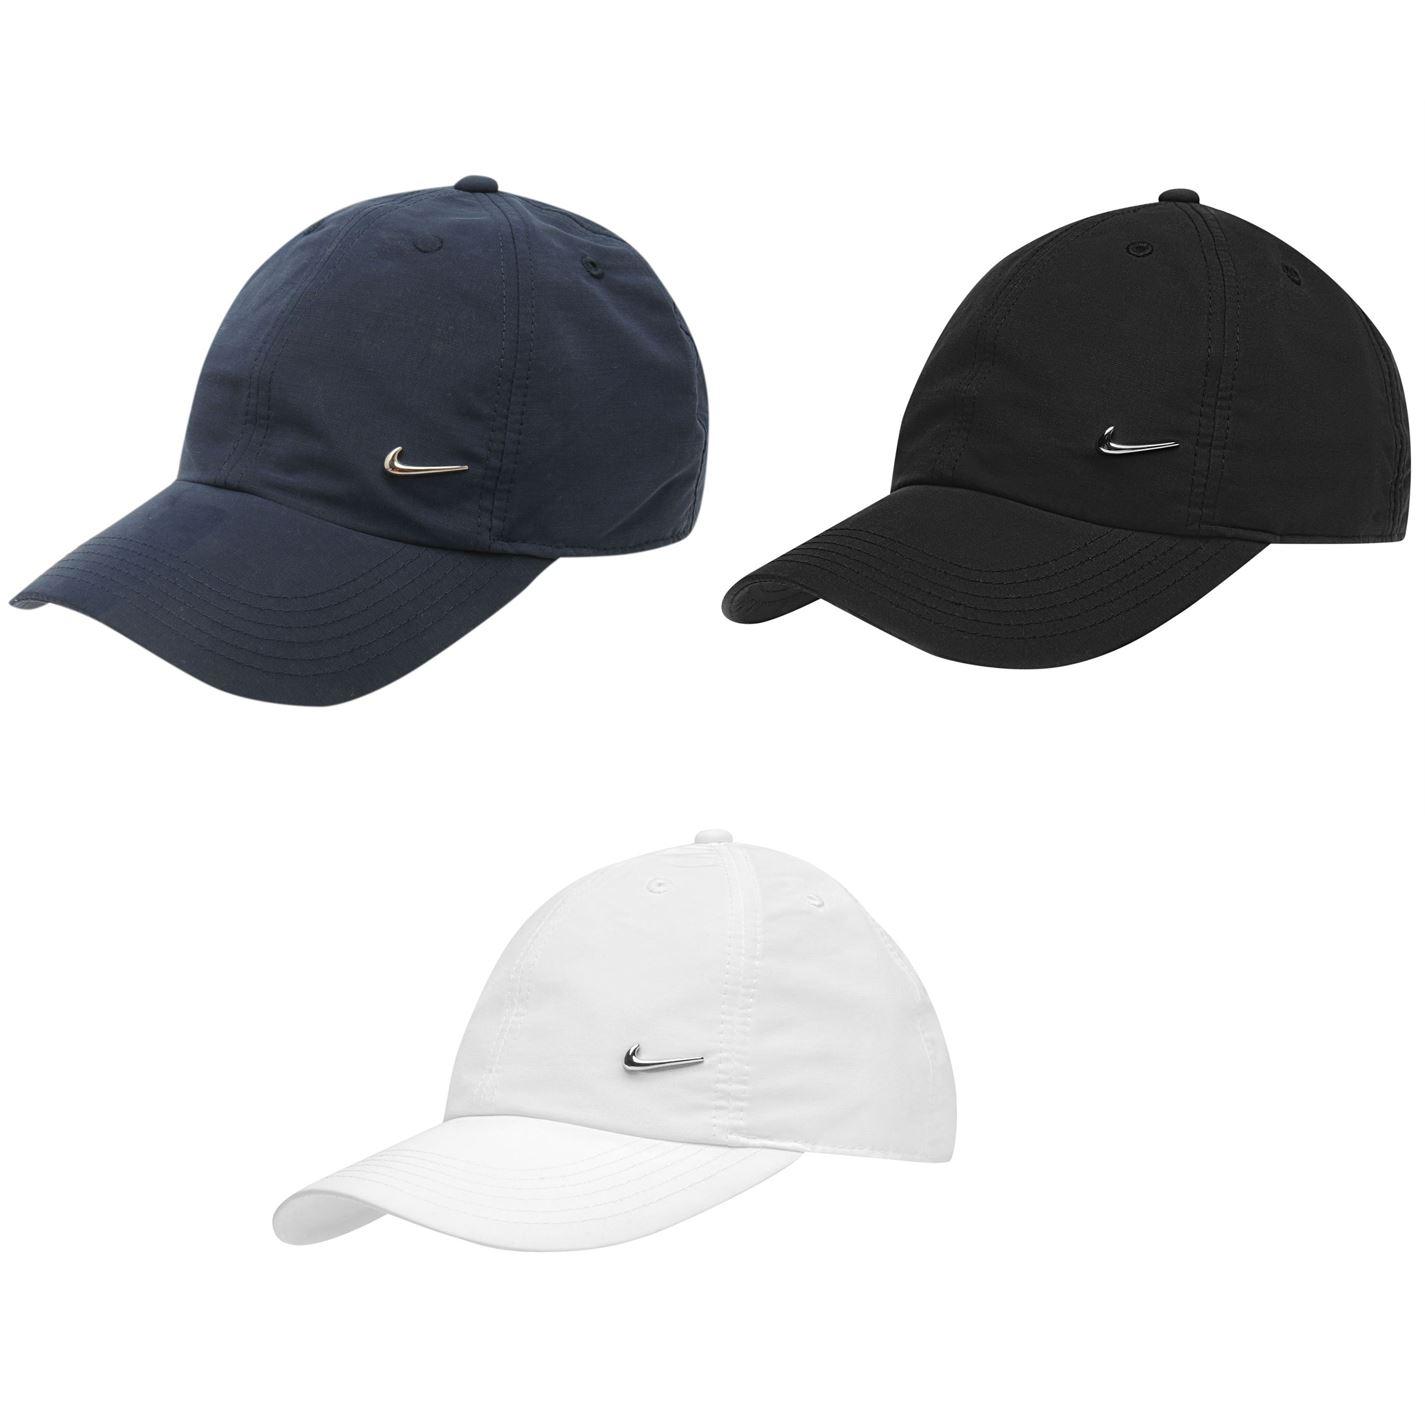 297590c73d1f4 Details about Nike Met Swoosh Cap Junior Boys Baseball Hat Headwear